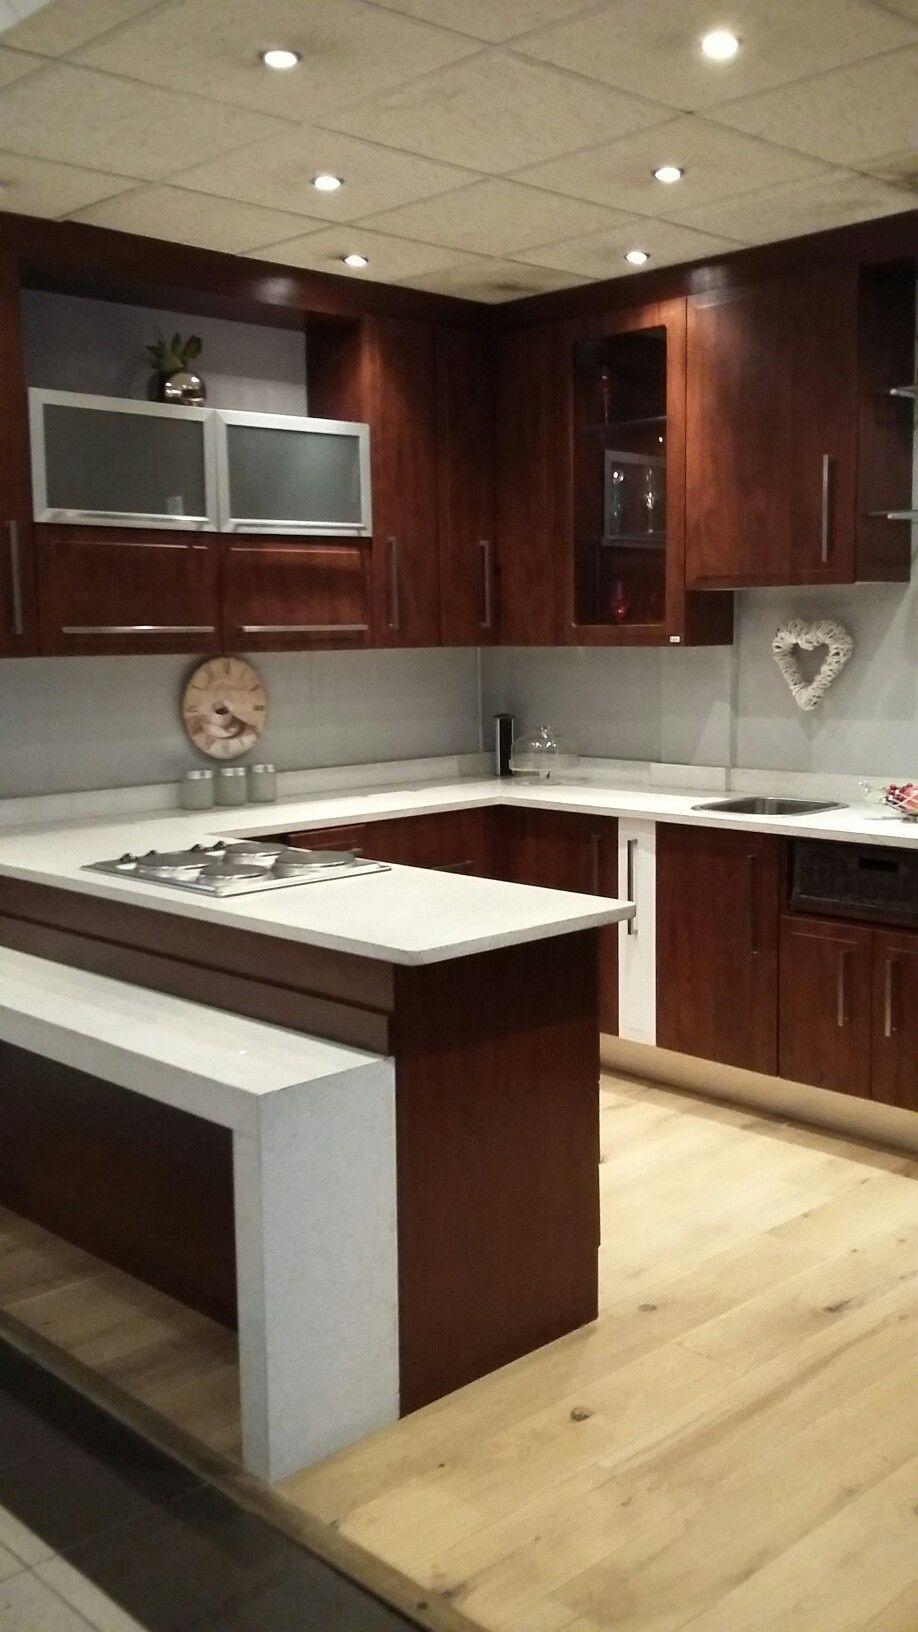 Stunning Kitchen Design In The Home Ideas Centre Banos